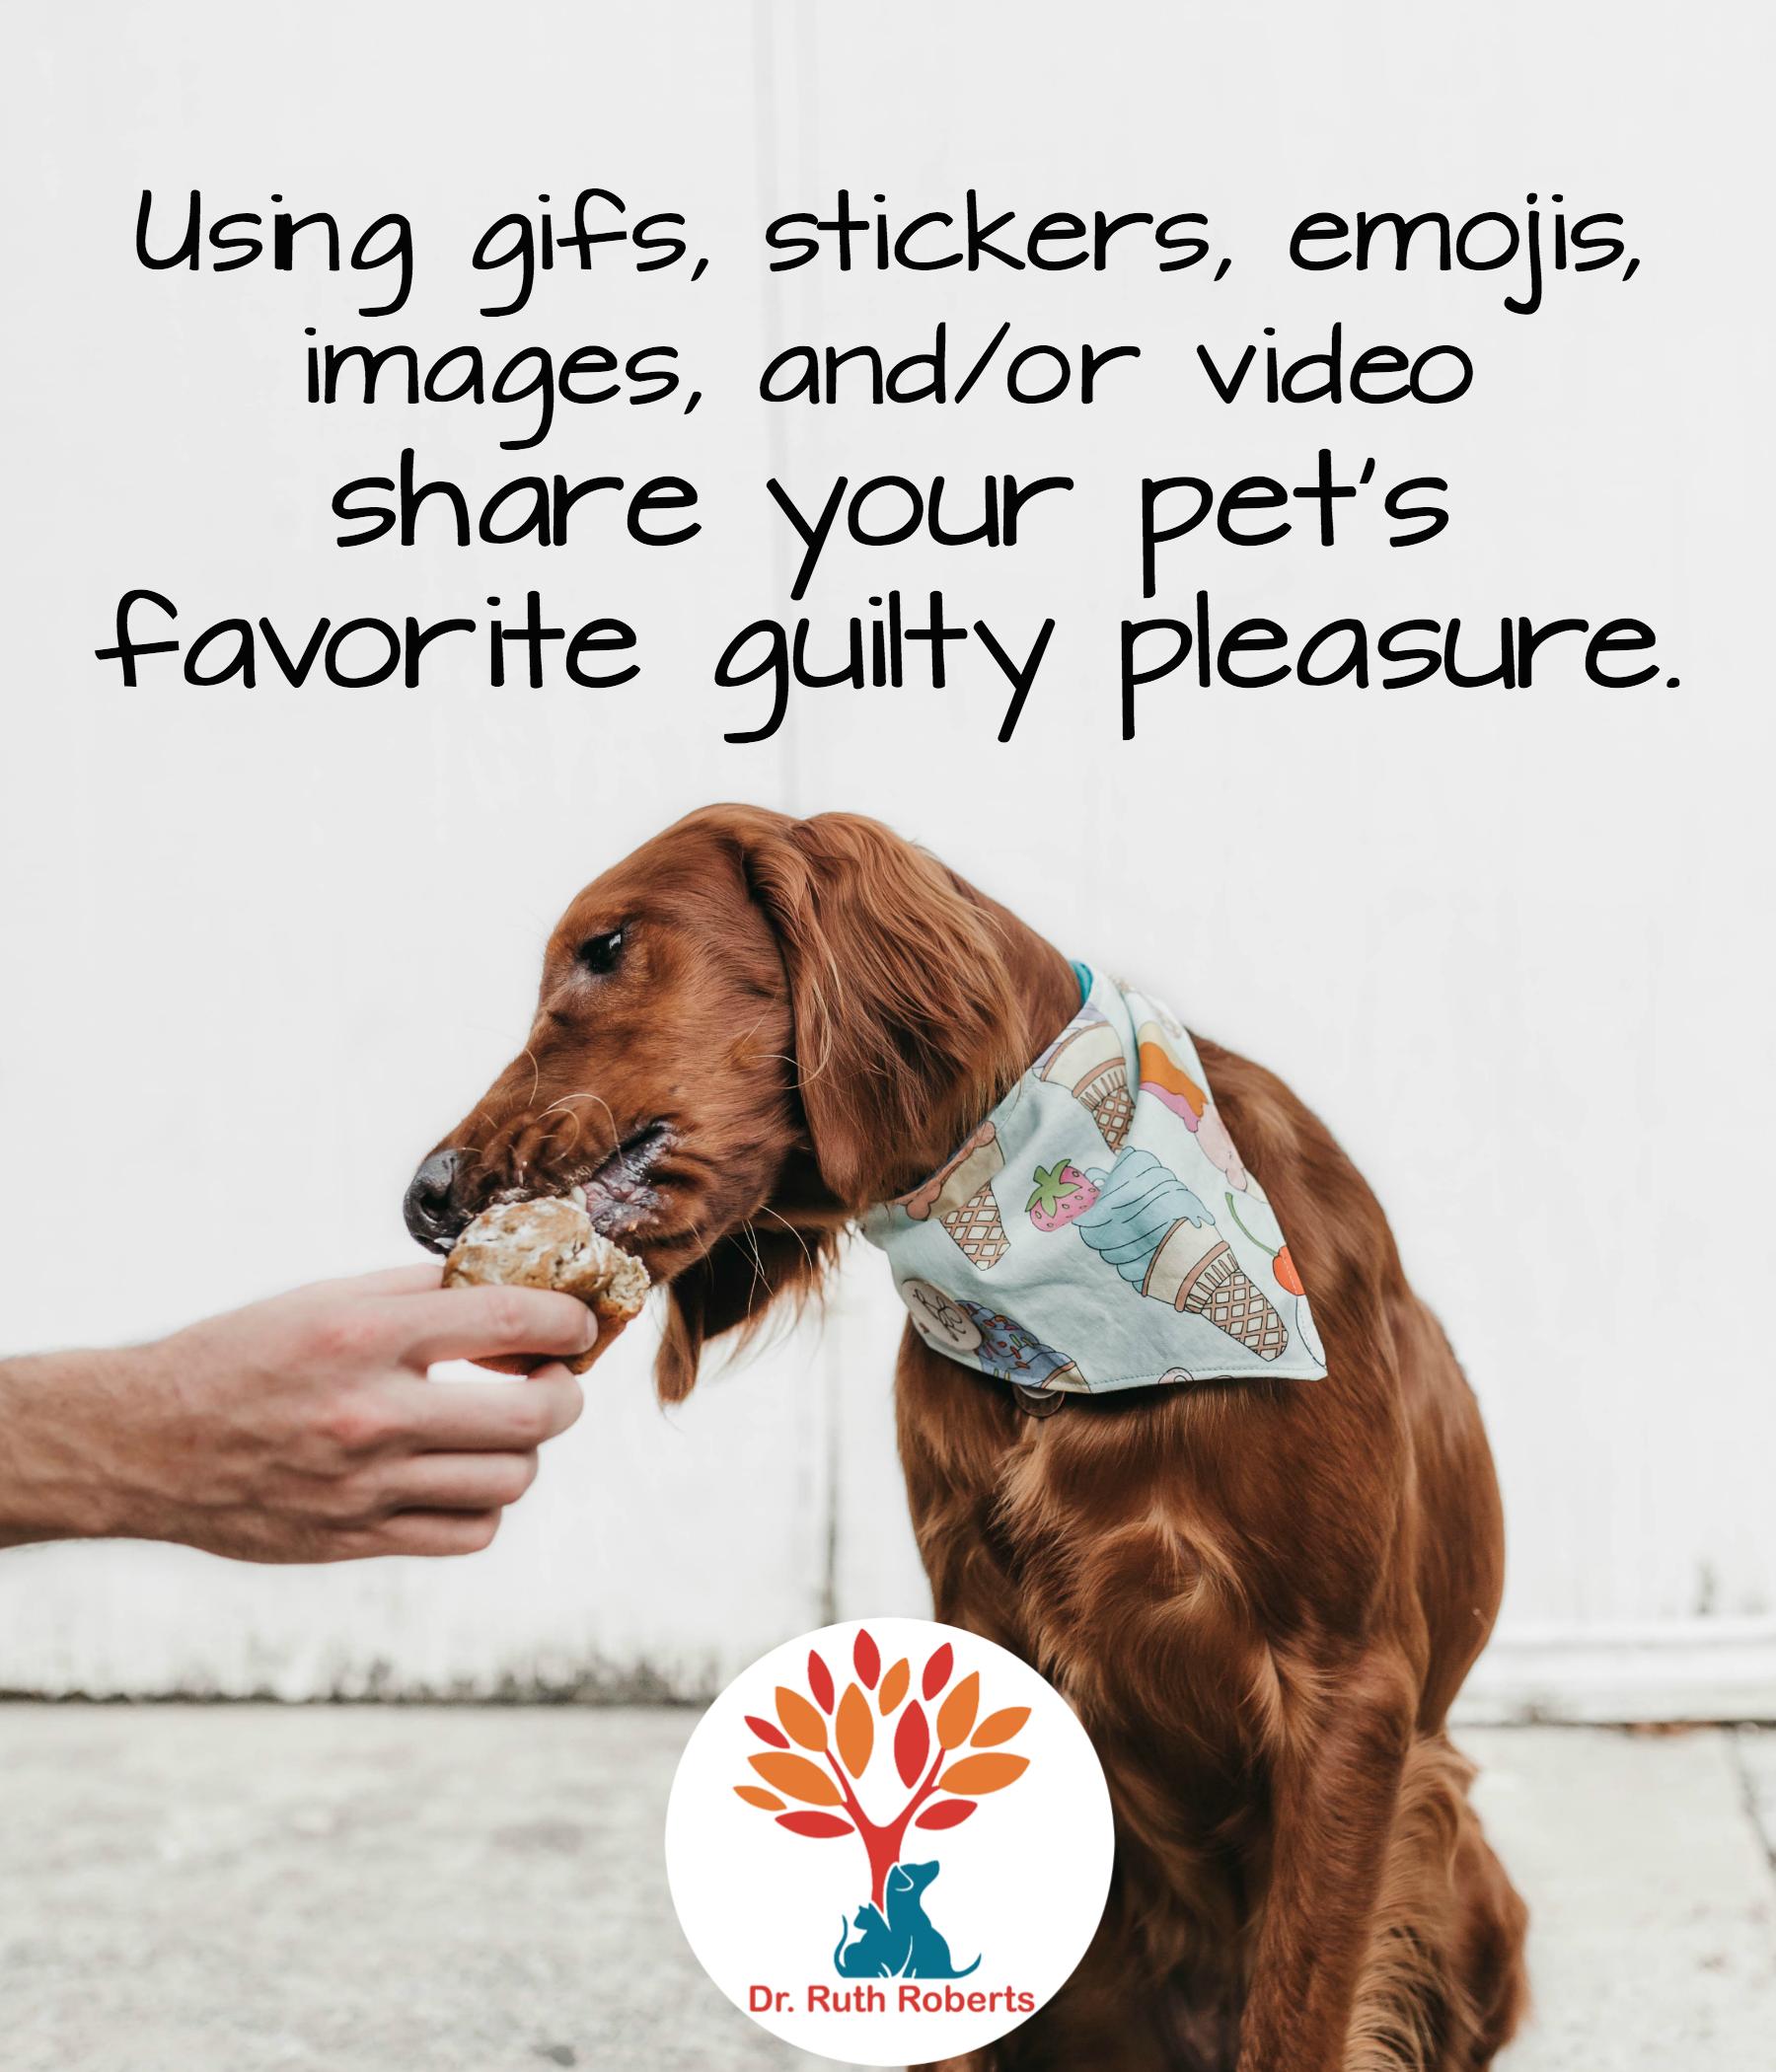 #quotes #animals #guilty #pleasure